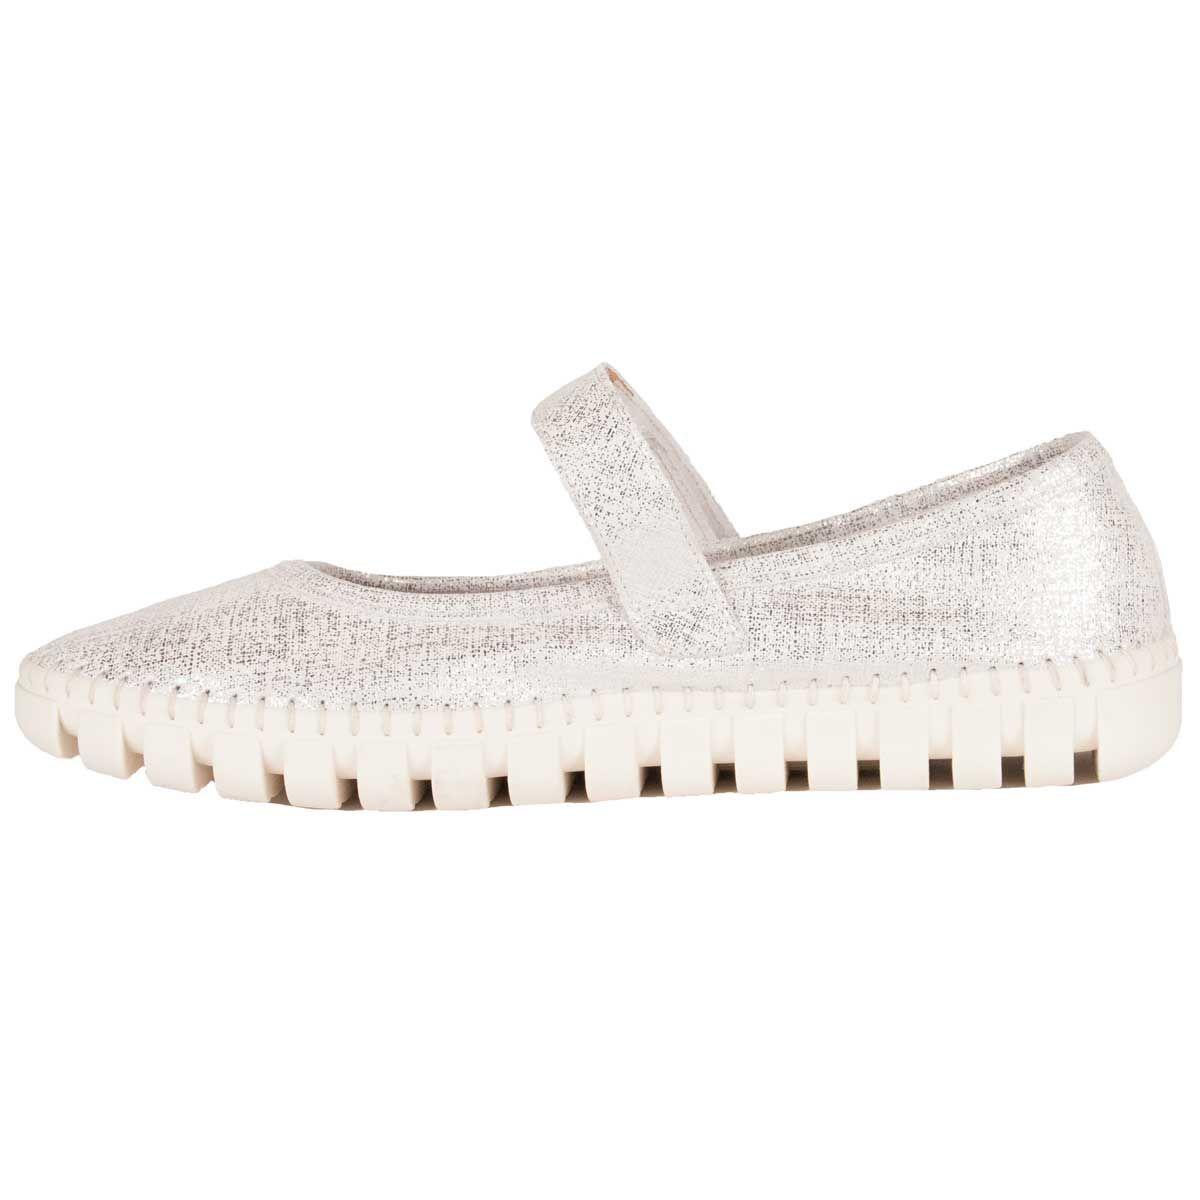 Purapiel Comfortable Sneaker in Silver